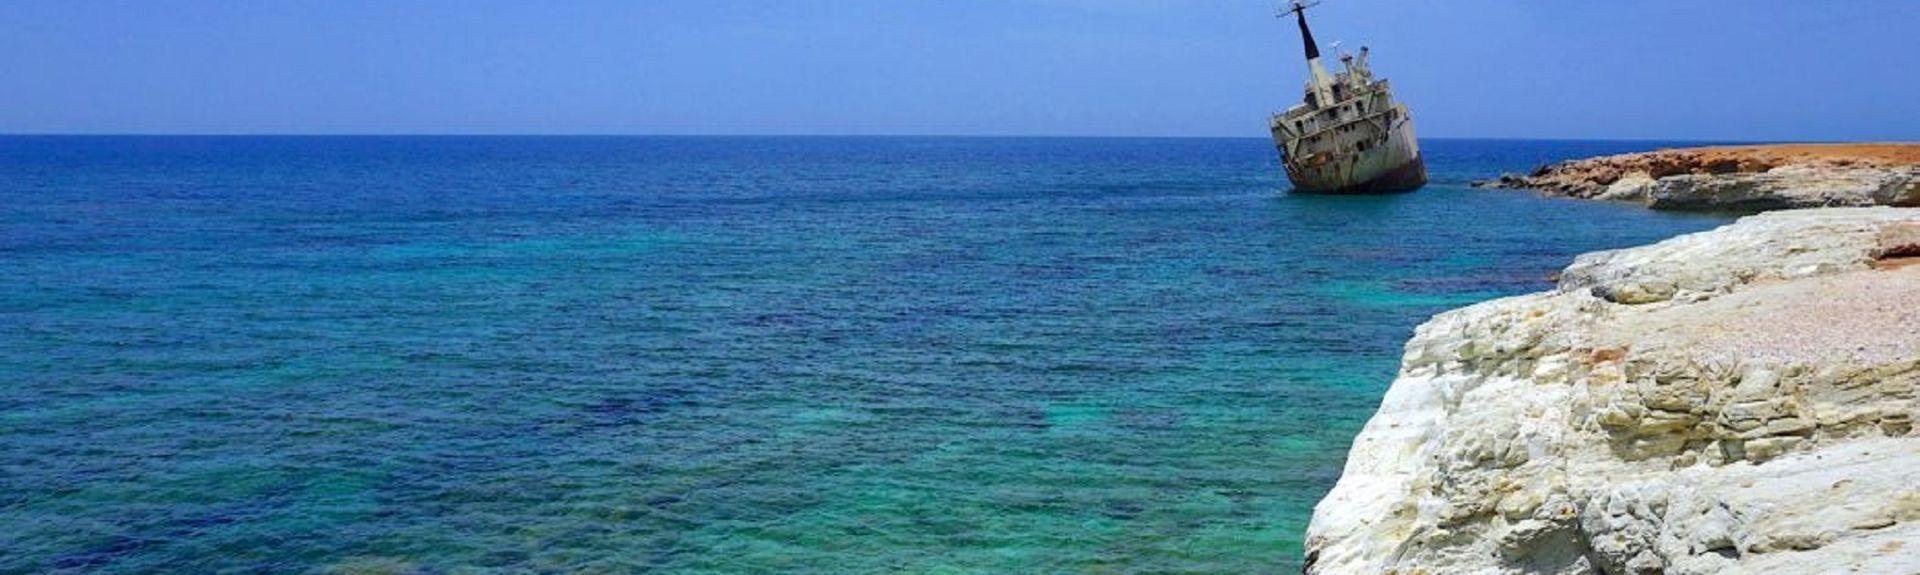 Kato Paphos, Paphos, Cyprus